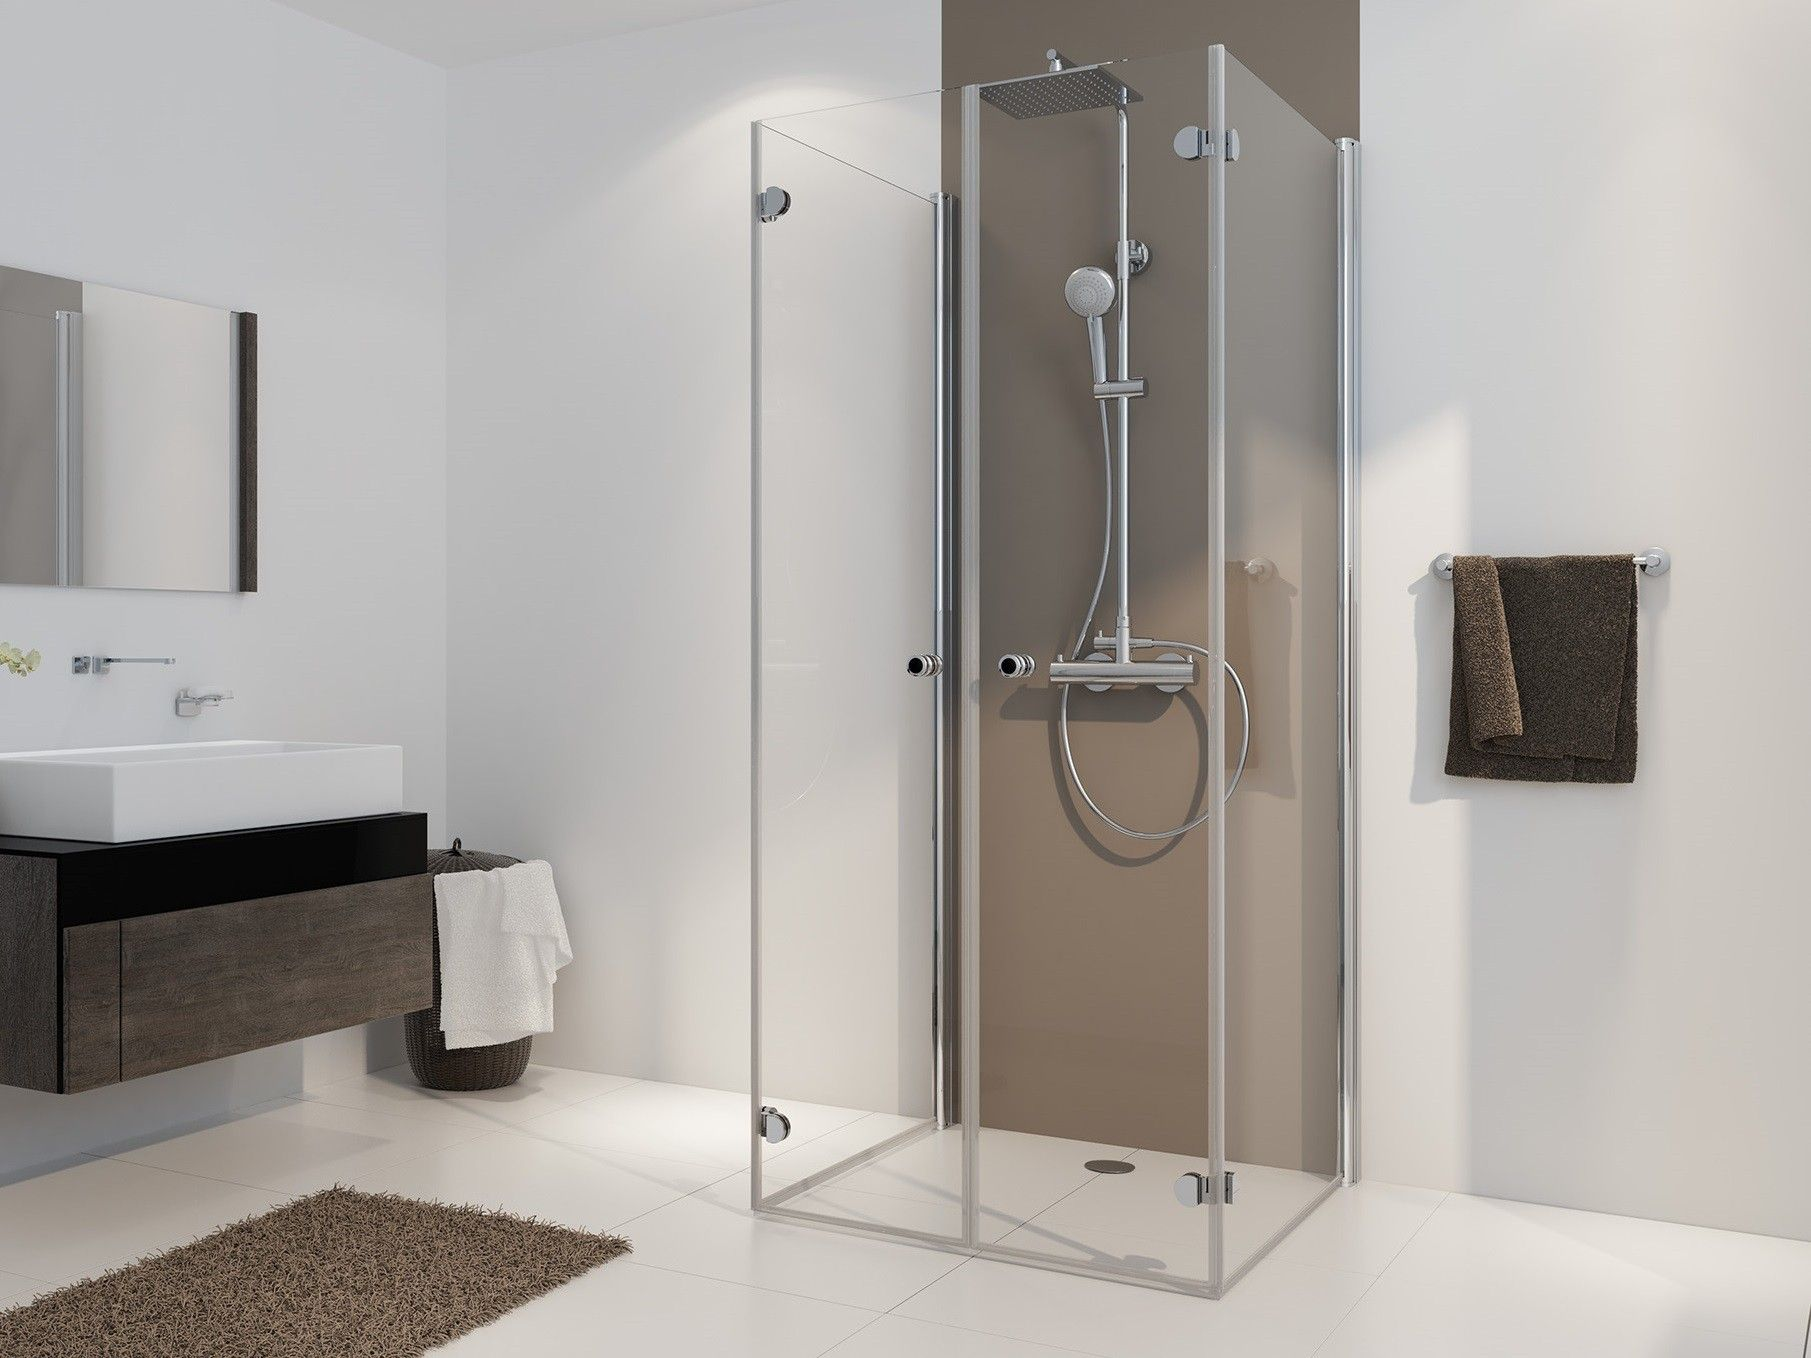 Falttur Dusche U Form Bad Design Heizung Duschkabine U Form Falttur Dusche Duschabtrennung